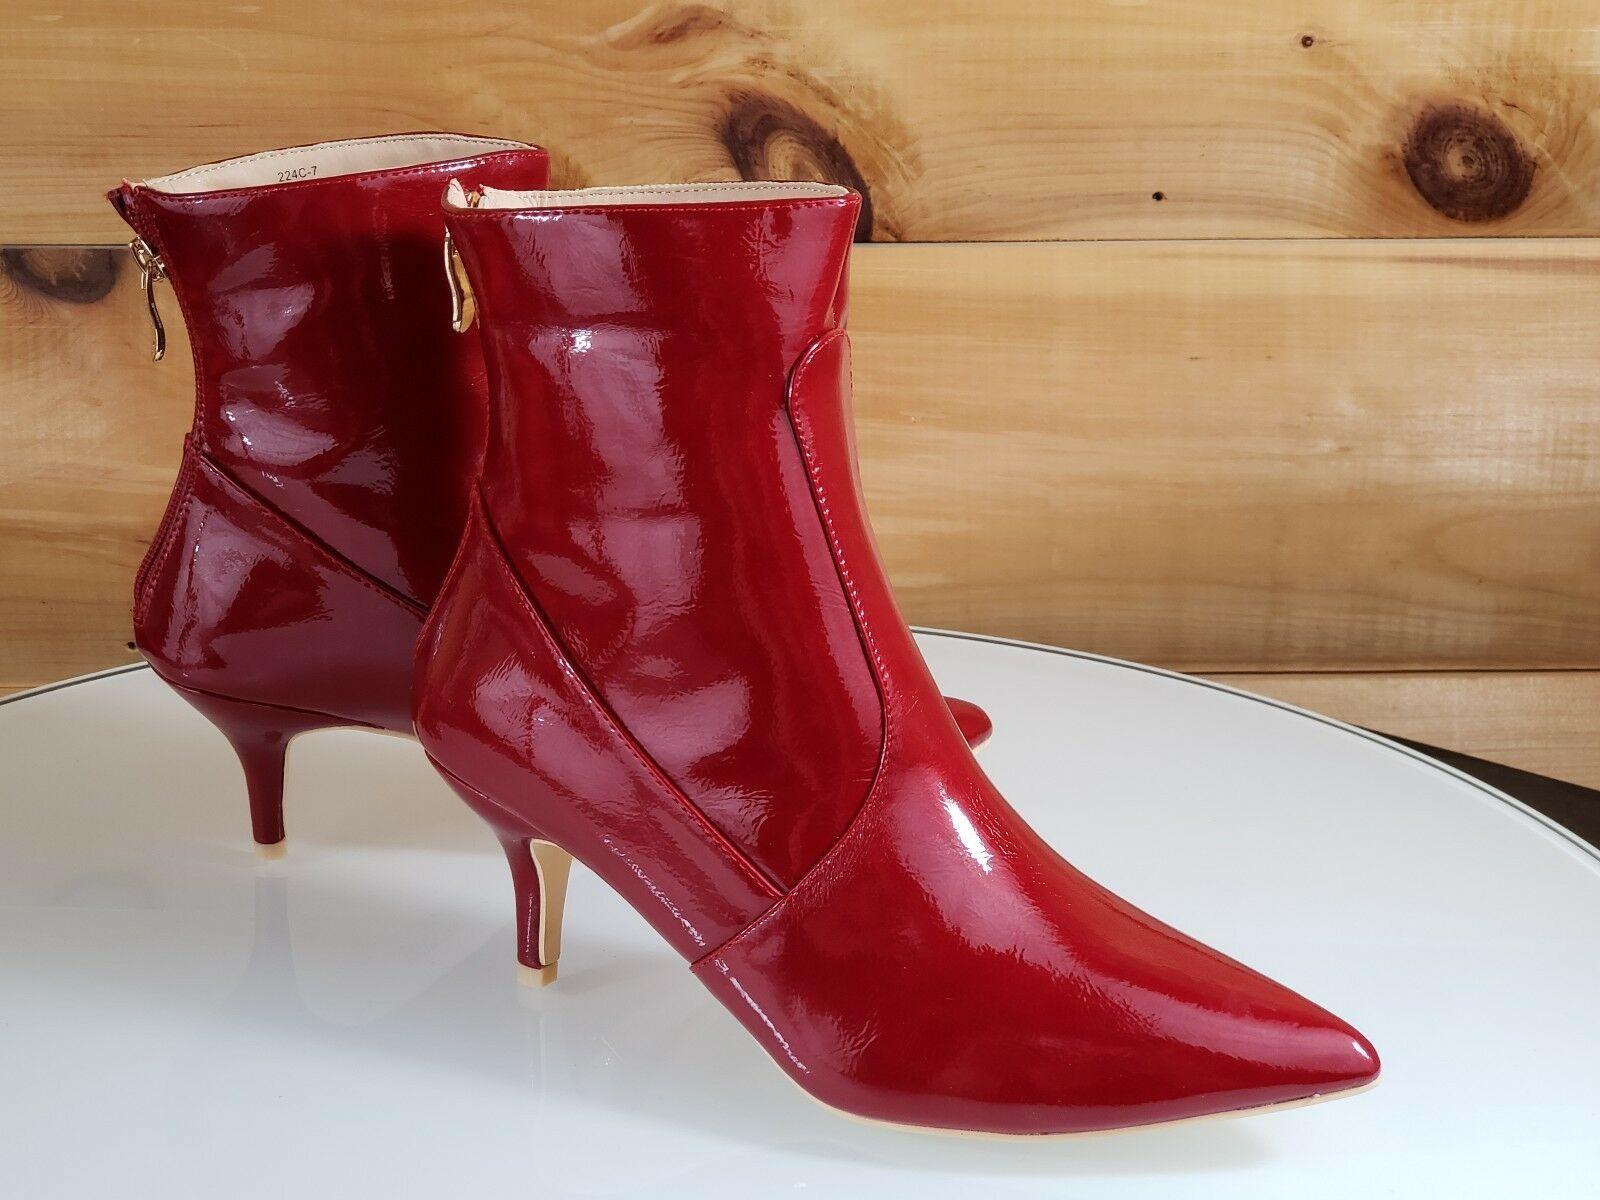 Mac J Red Wine Vegan Pointy Toe 2 5 Kitten Heel Ankle Boot Kitten Heel Ankle Boots Kitten Heel Boots Boots